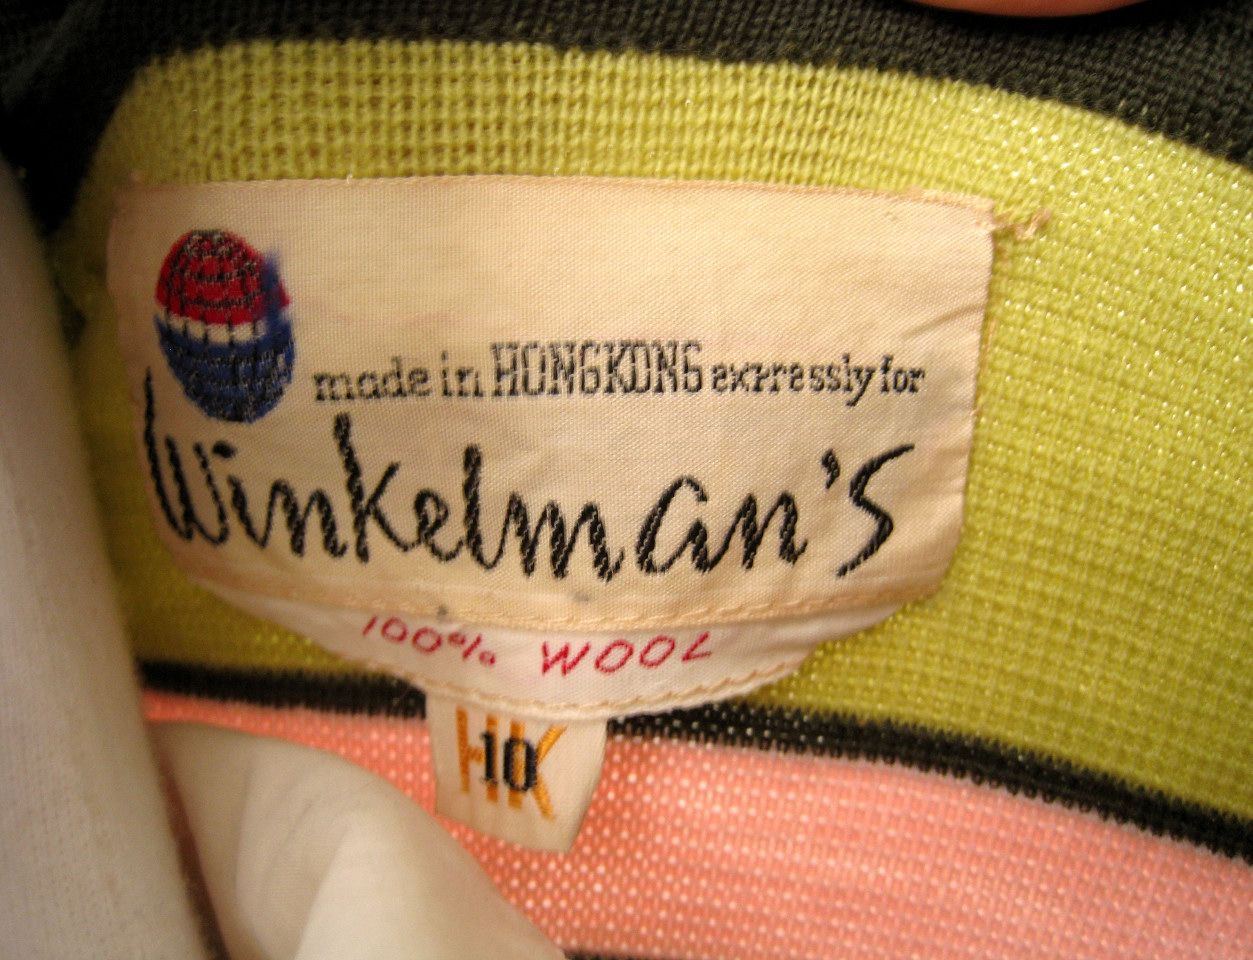 Winkelman's vintage clothing label from 60's knit cardigan